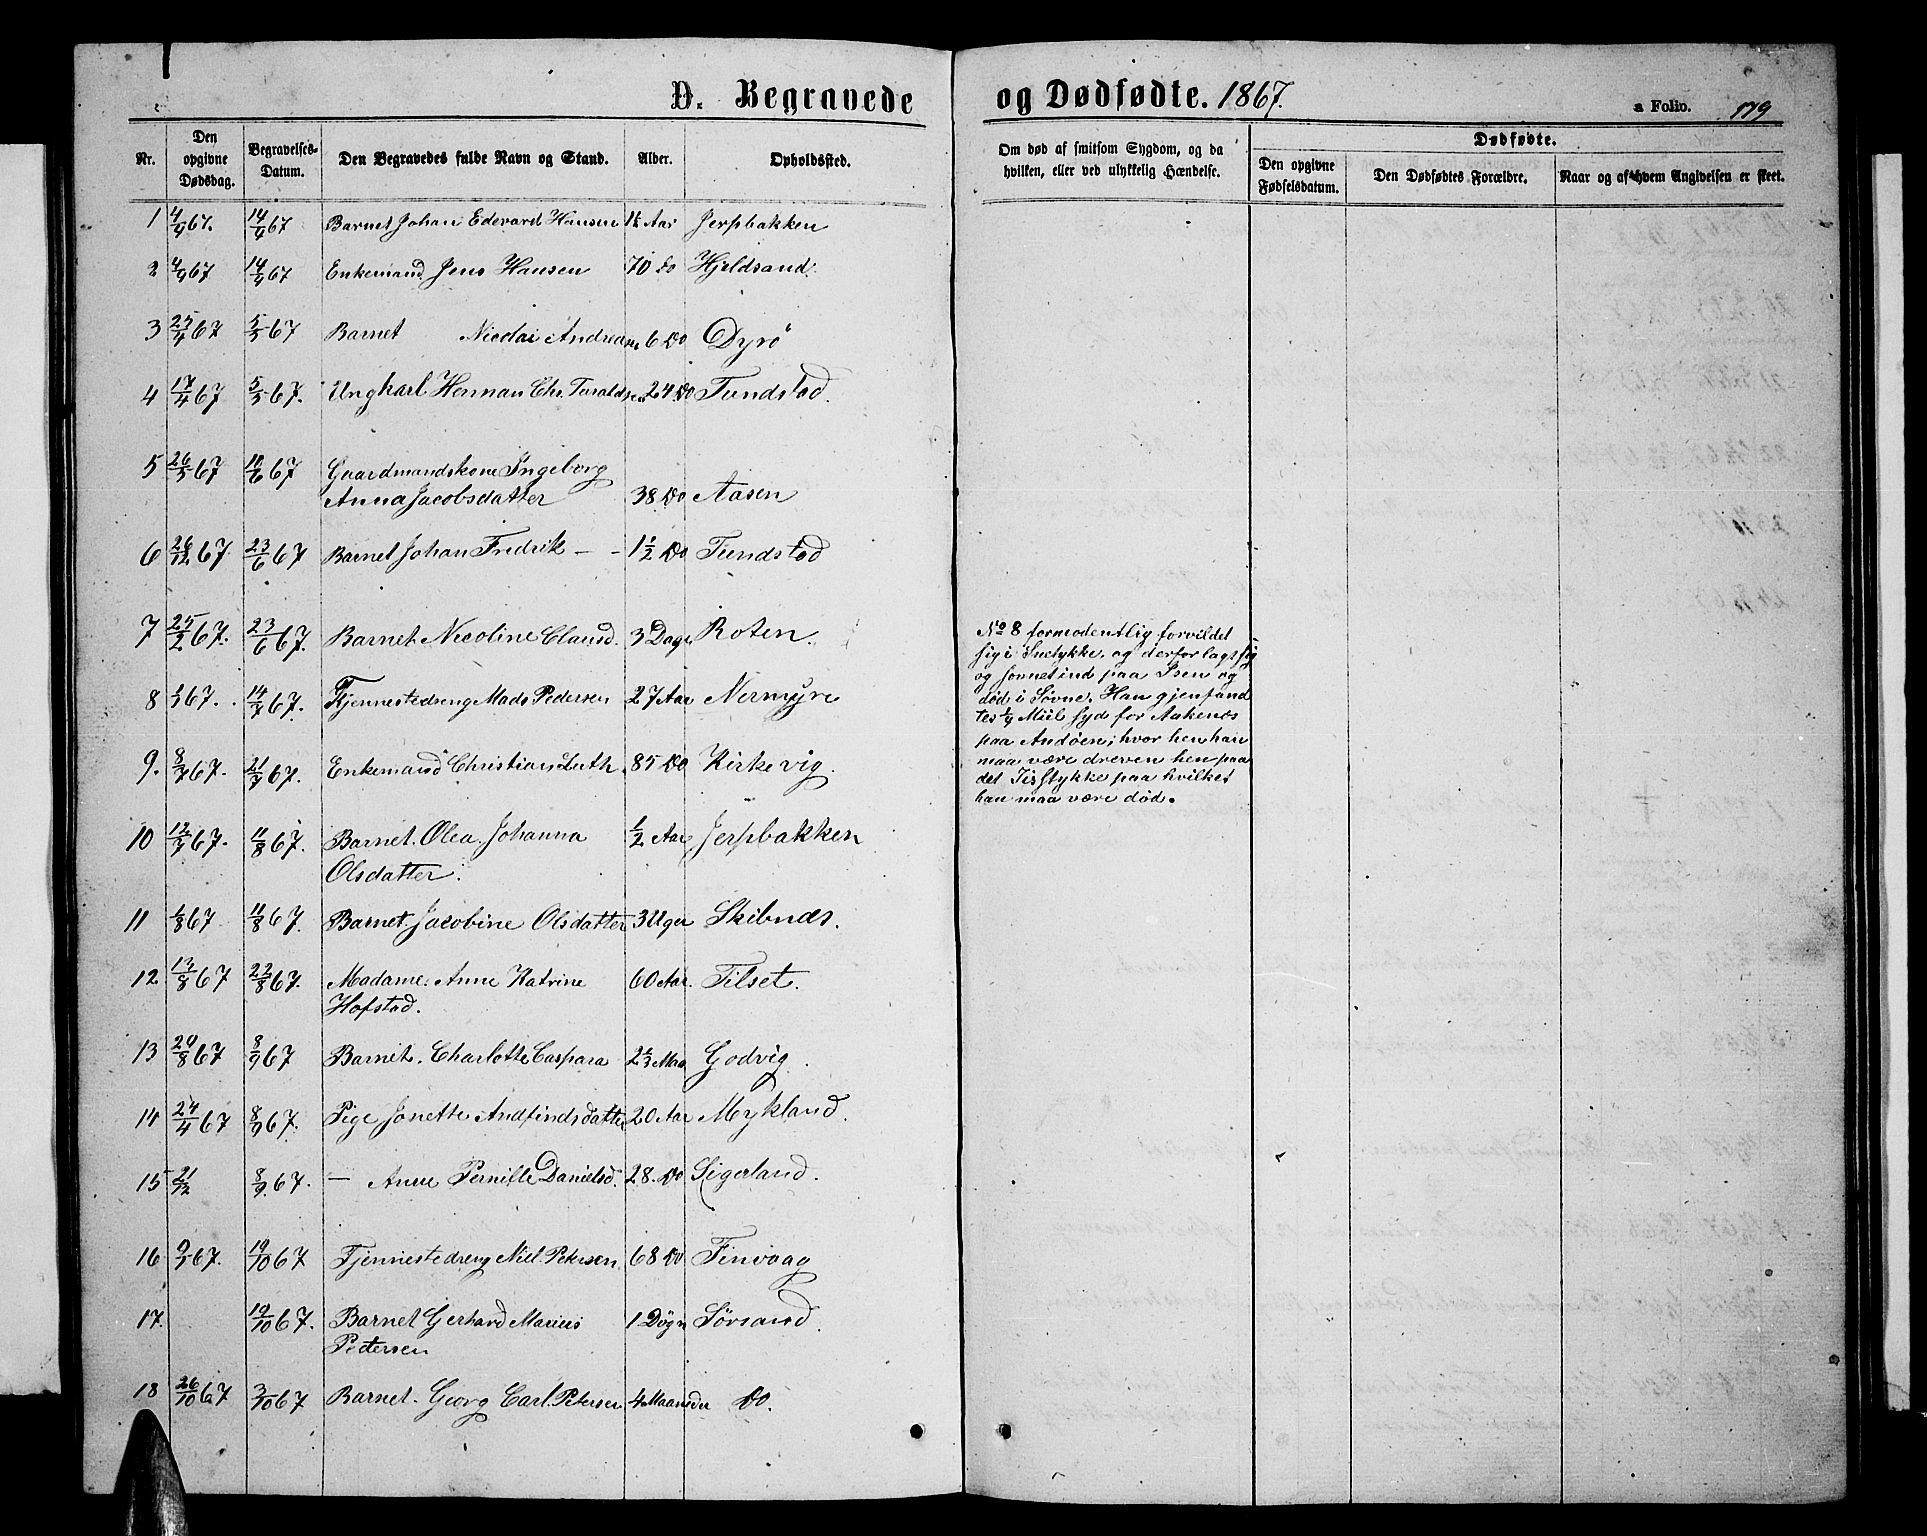 SAT, Ministerialprotokoller, klokkerbøker og fødselsregistre - Nordland, 893/L1348: Klokkerbok nr. 893C03, 1867-1877, s. 179